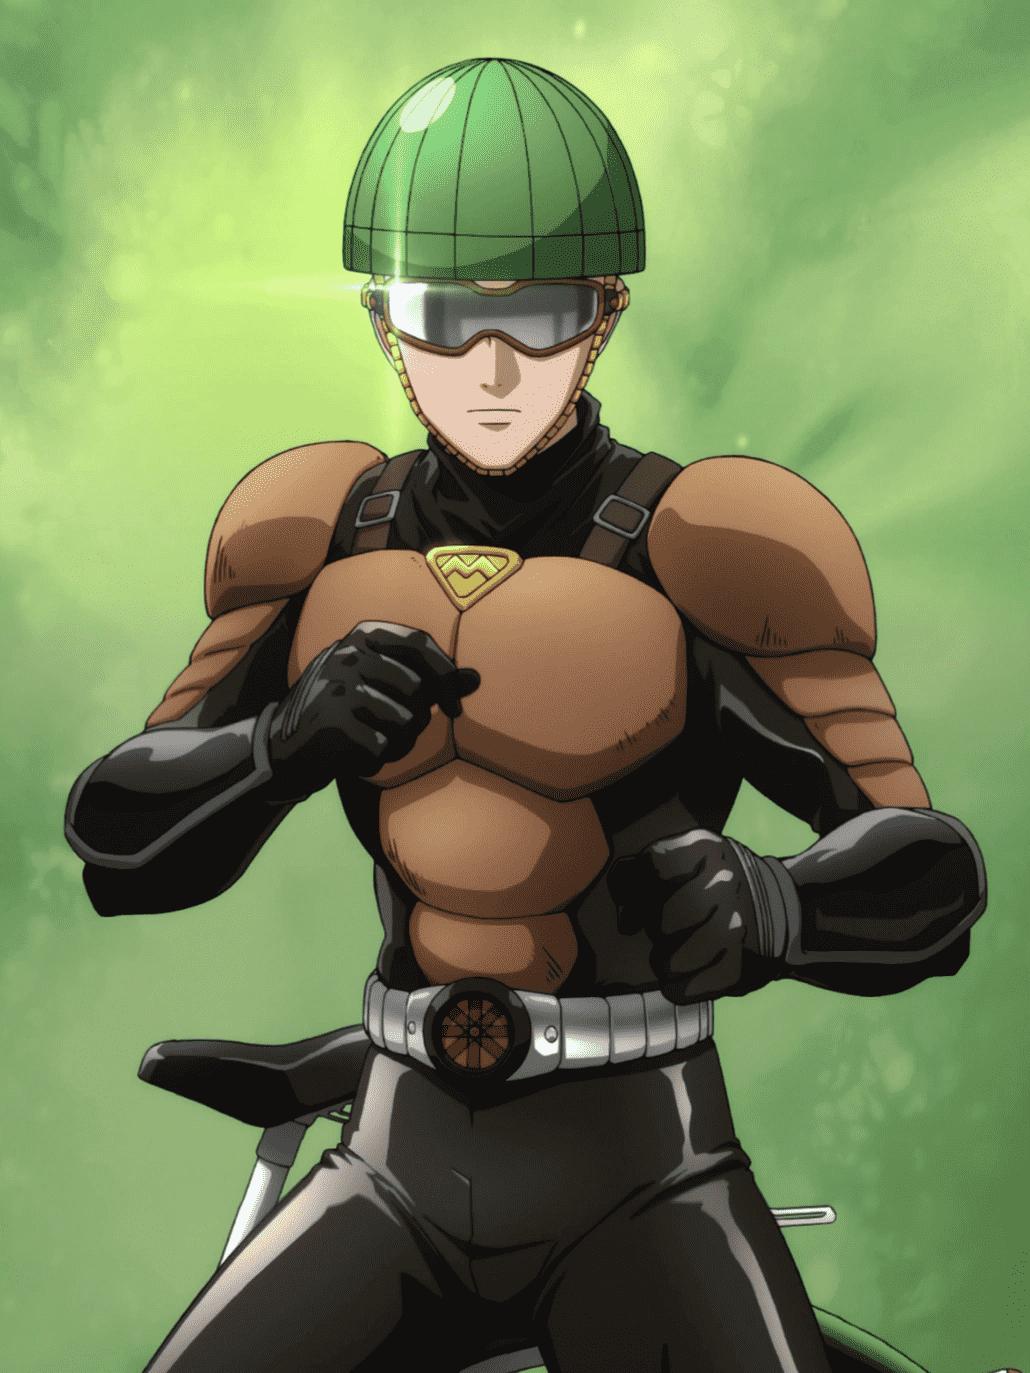 Mumen Rider from One Punch Man